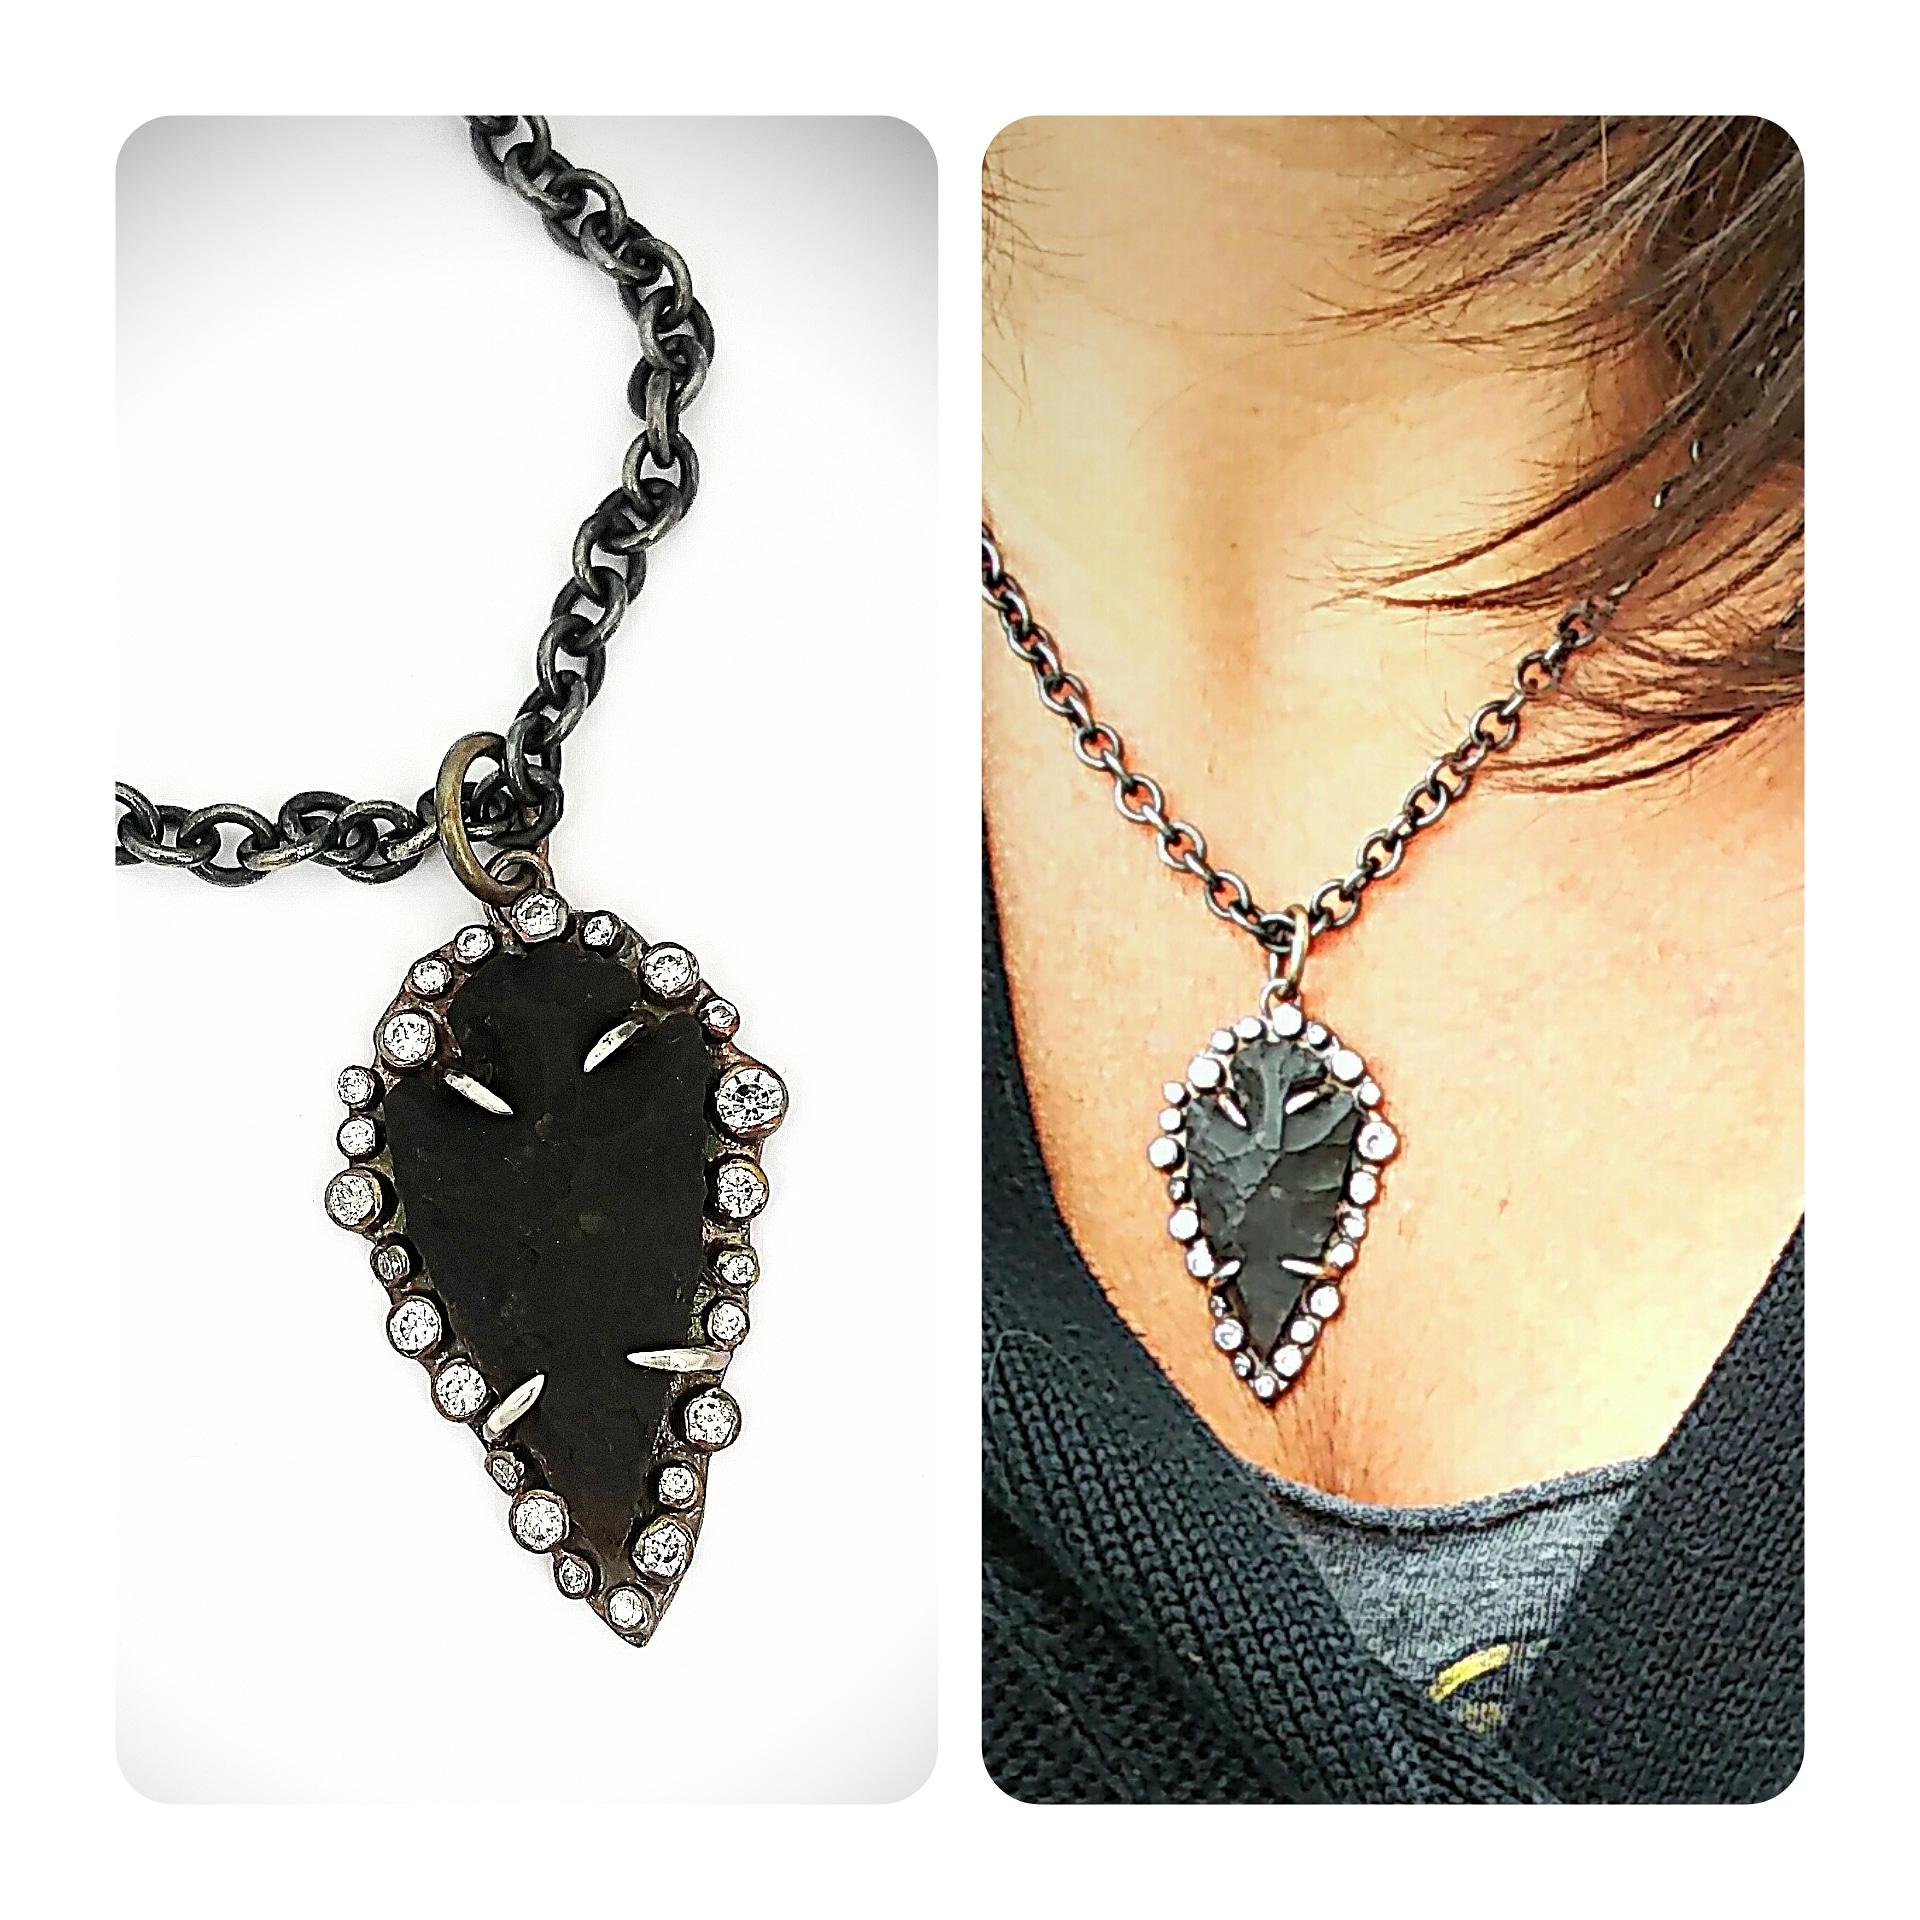 Encrusted Arrowhead Necklace